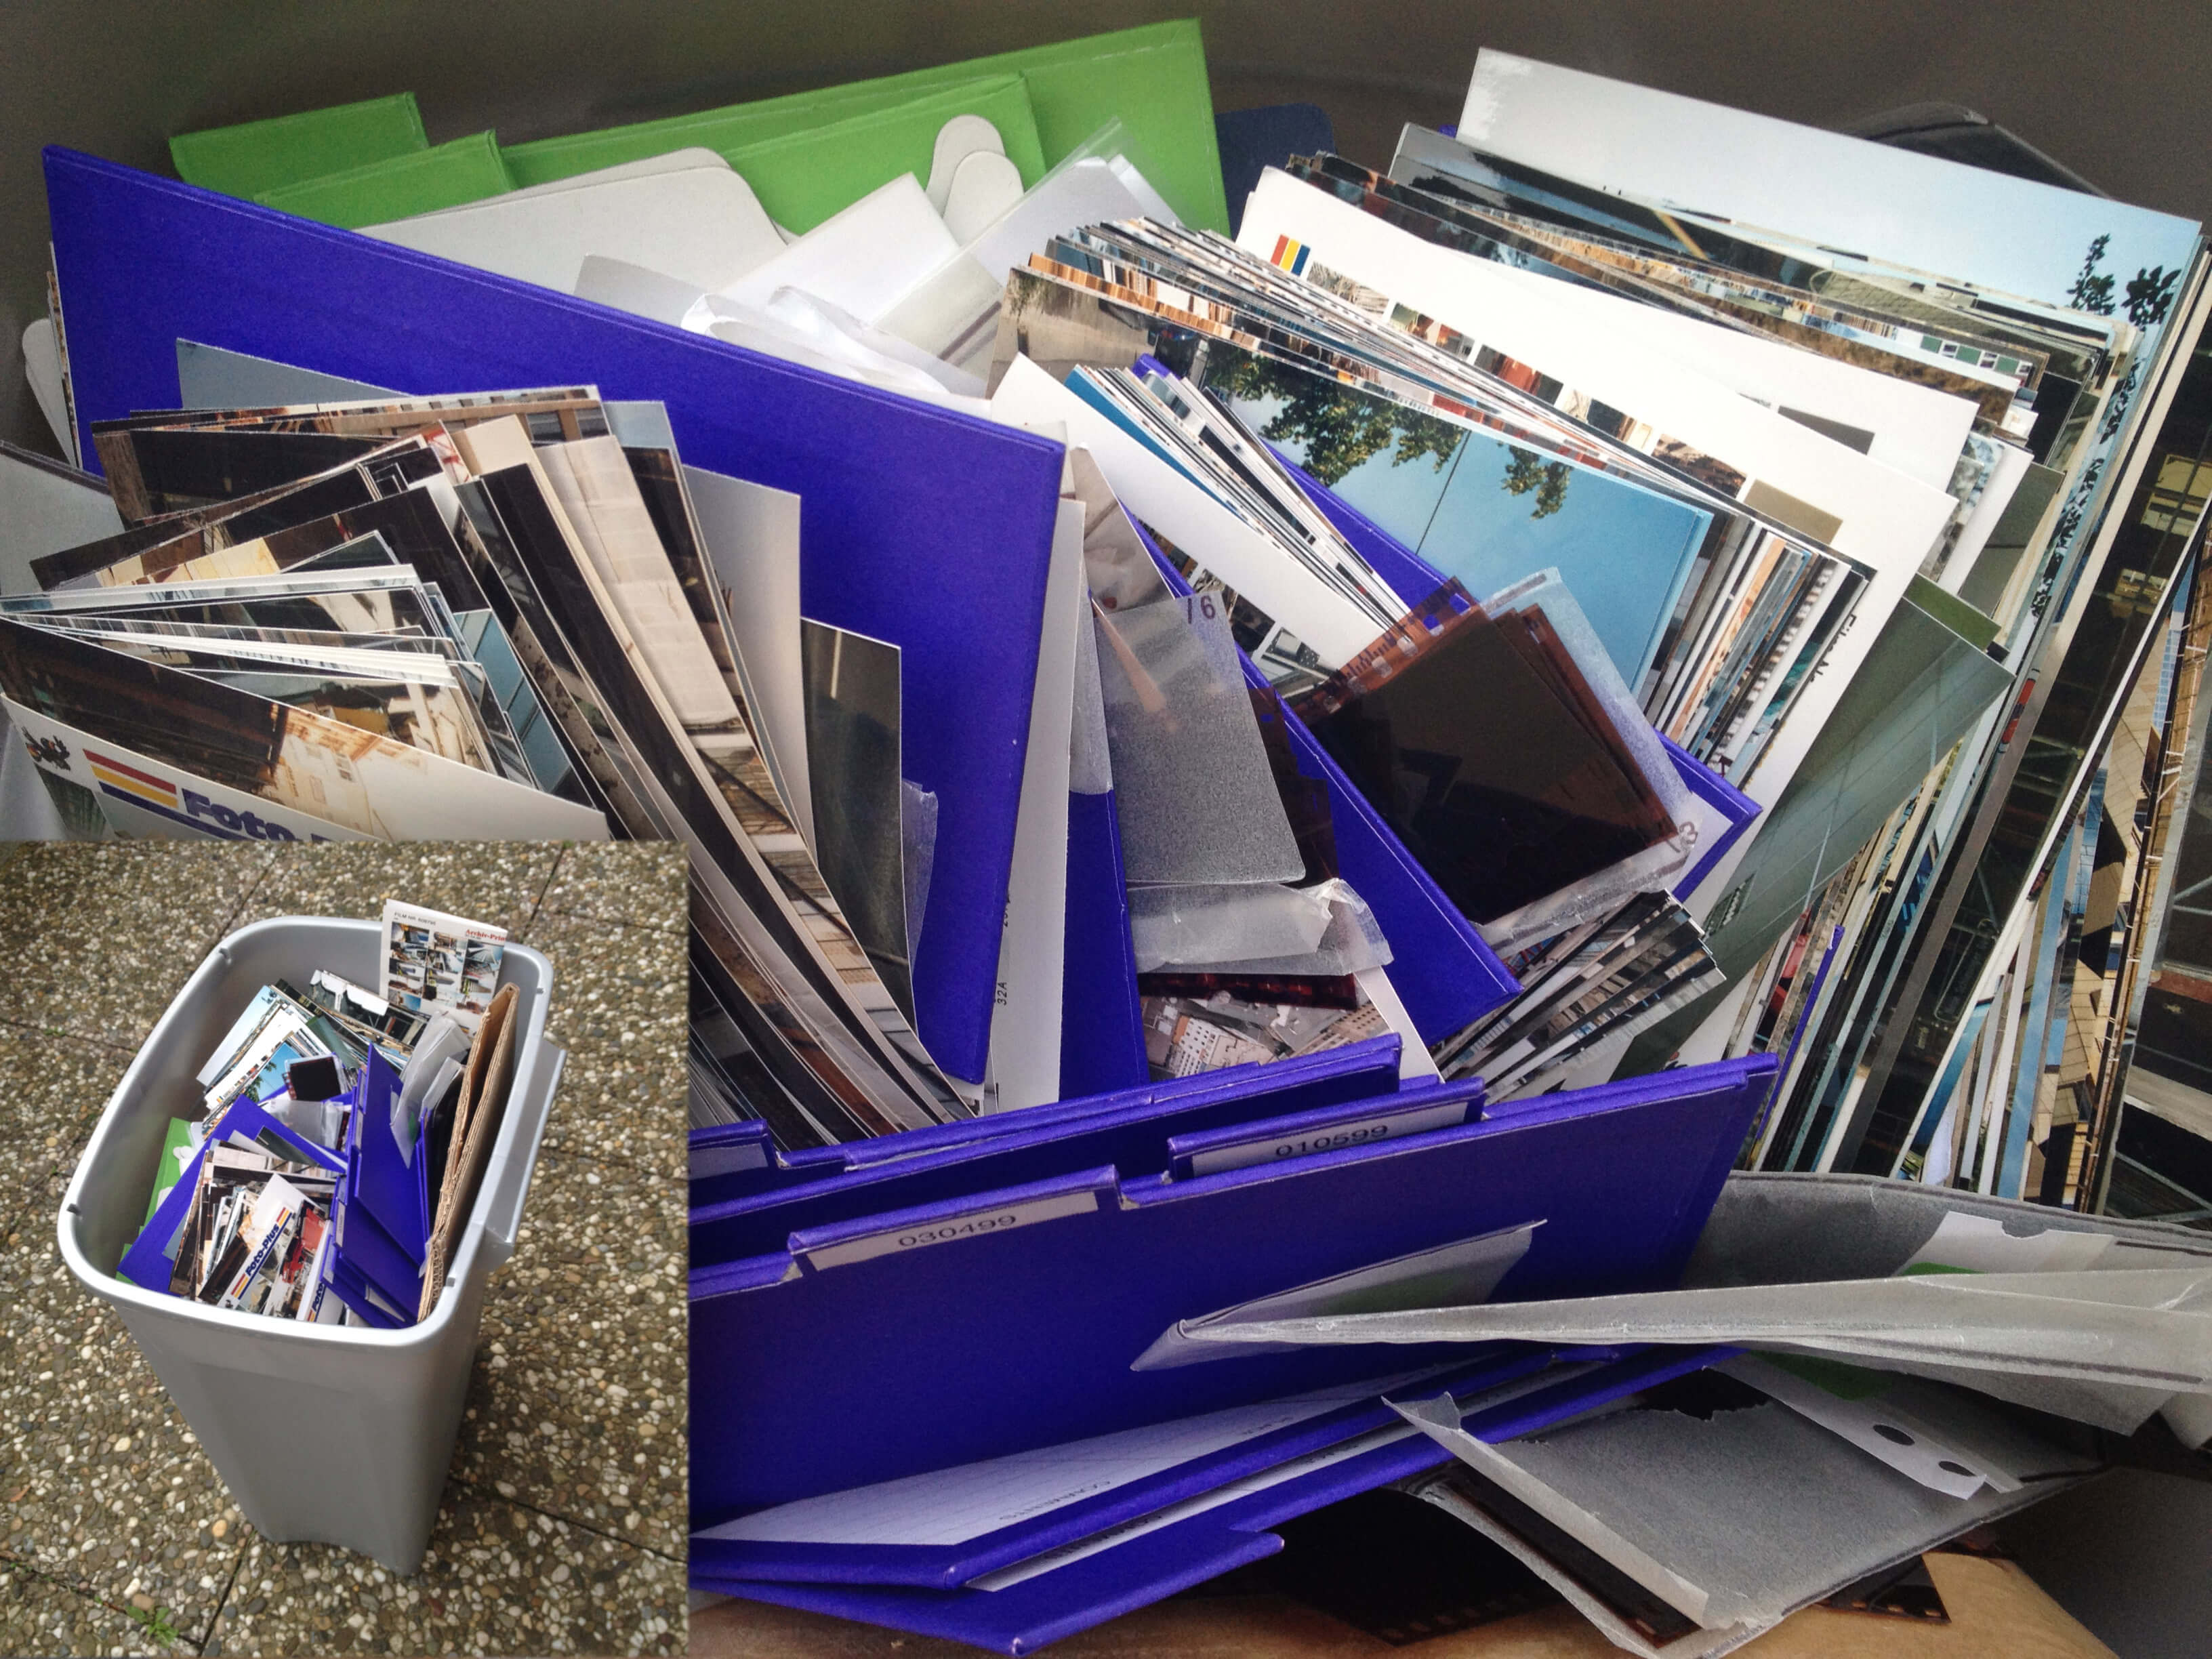 analoge Filme - analoge Fotos - Mülleimer - weggeschmissen